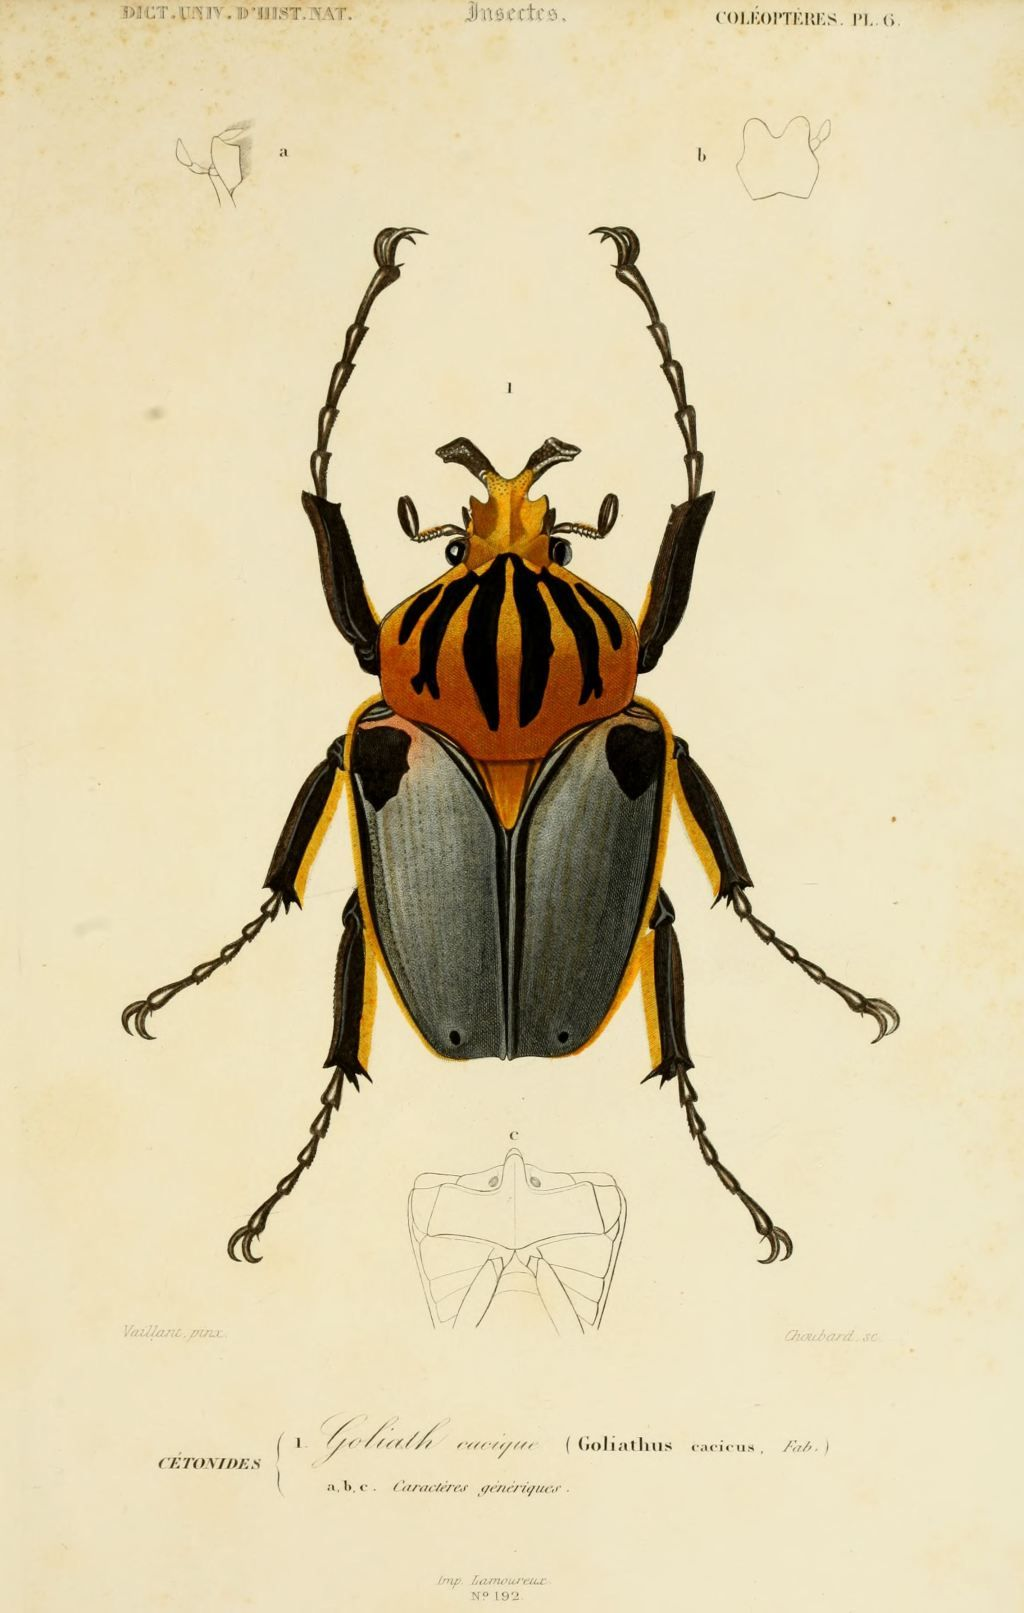 Les 25 meilleures id es de la cat gorie dessin insecte sur - Dessin d insectes a imprimer ...